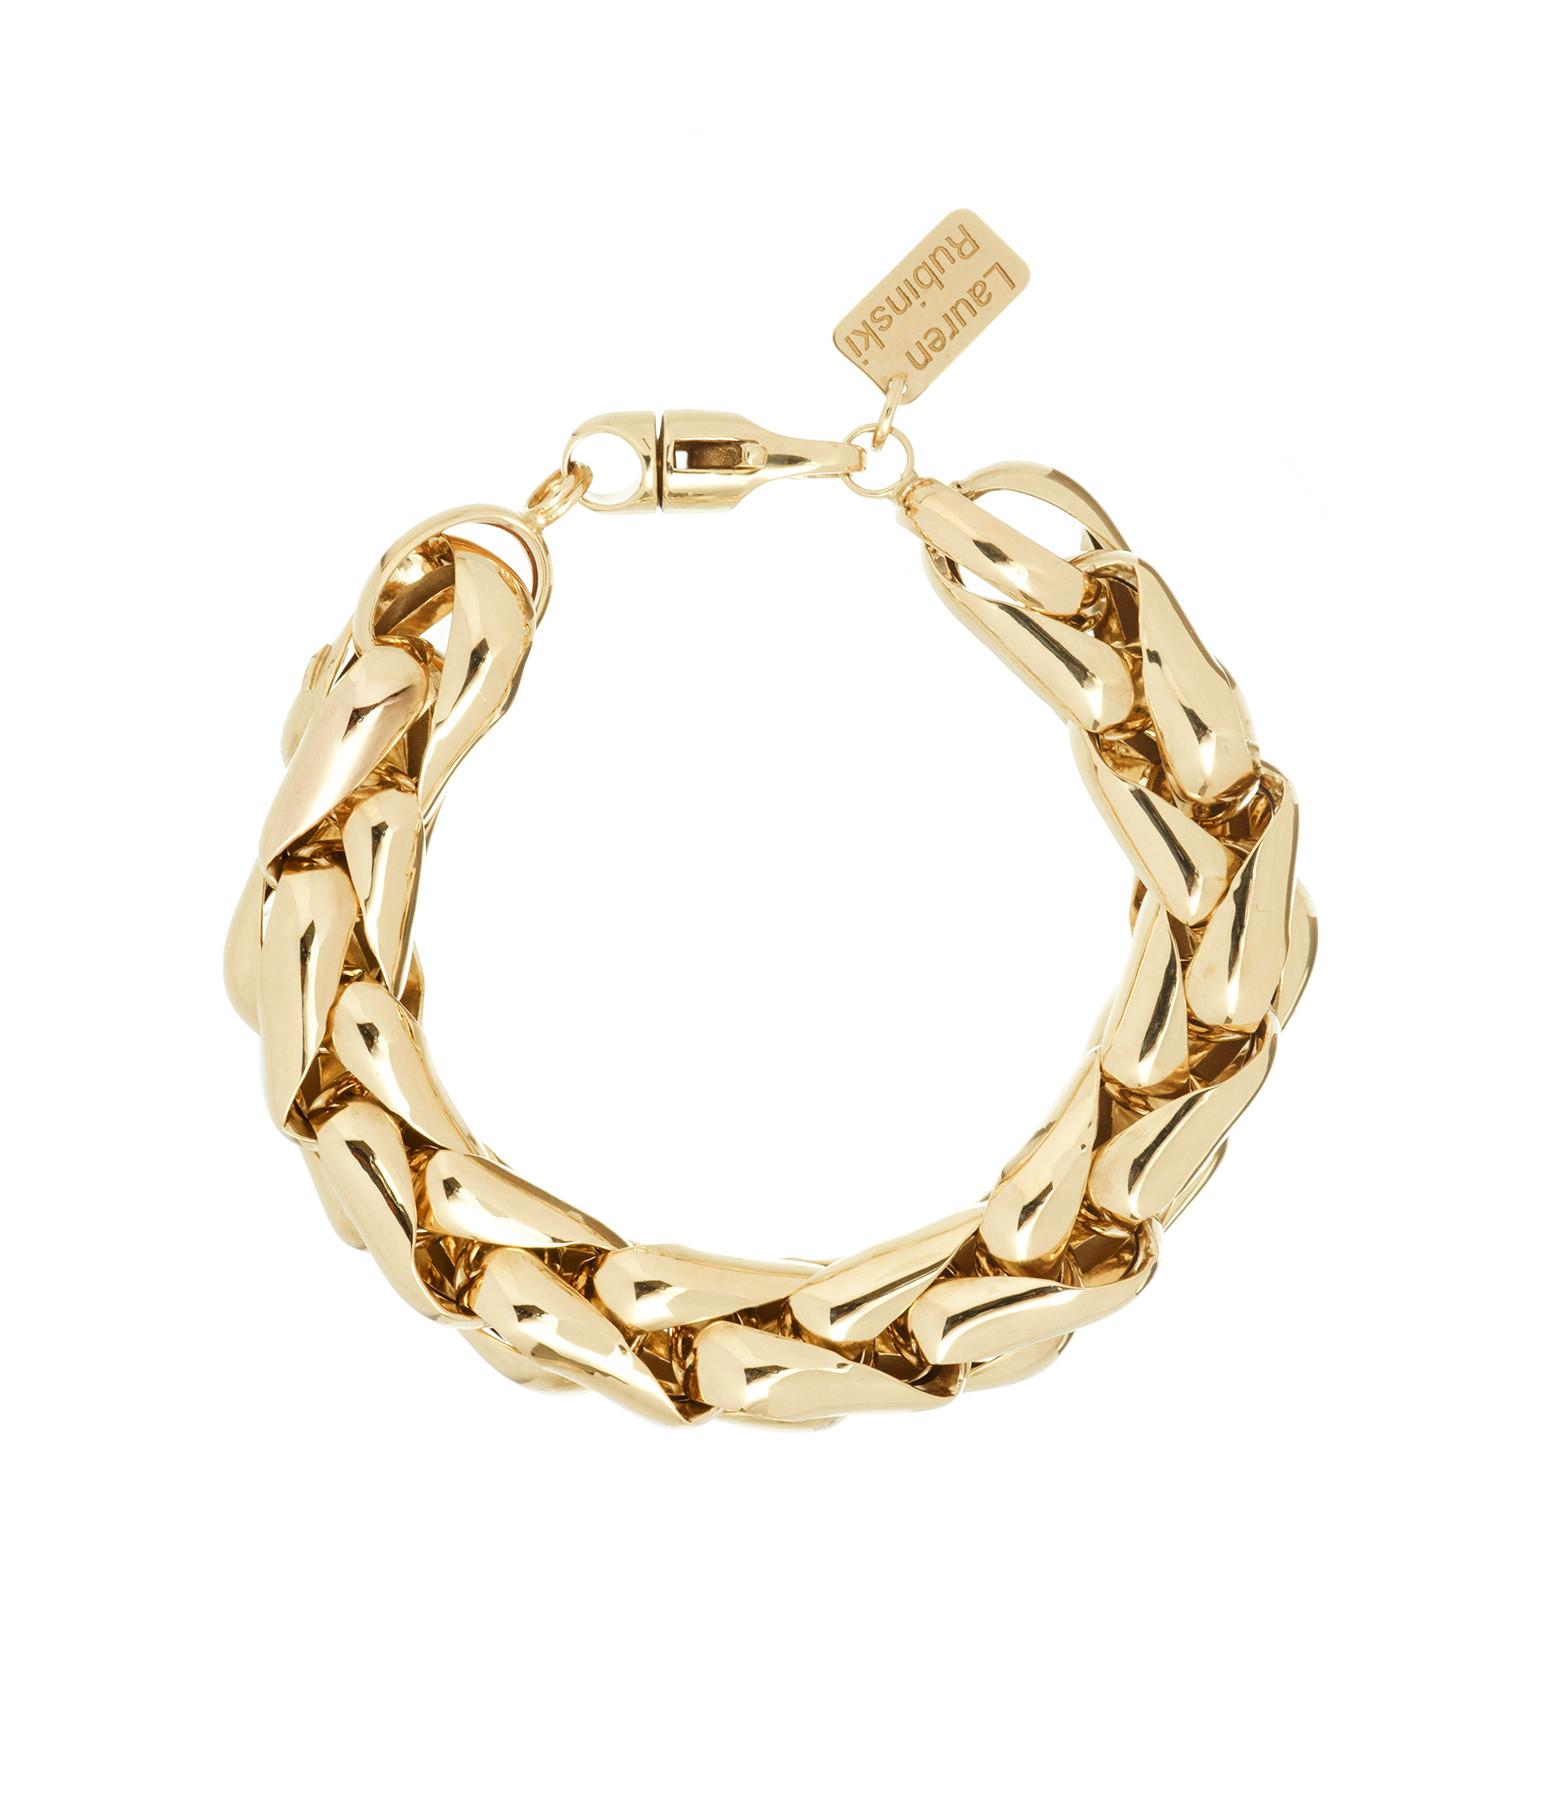 LAUREN RUBINSKI - Bracelet 14 Carats Or Jaune